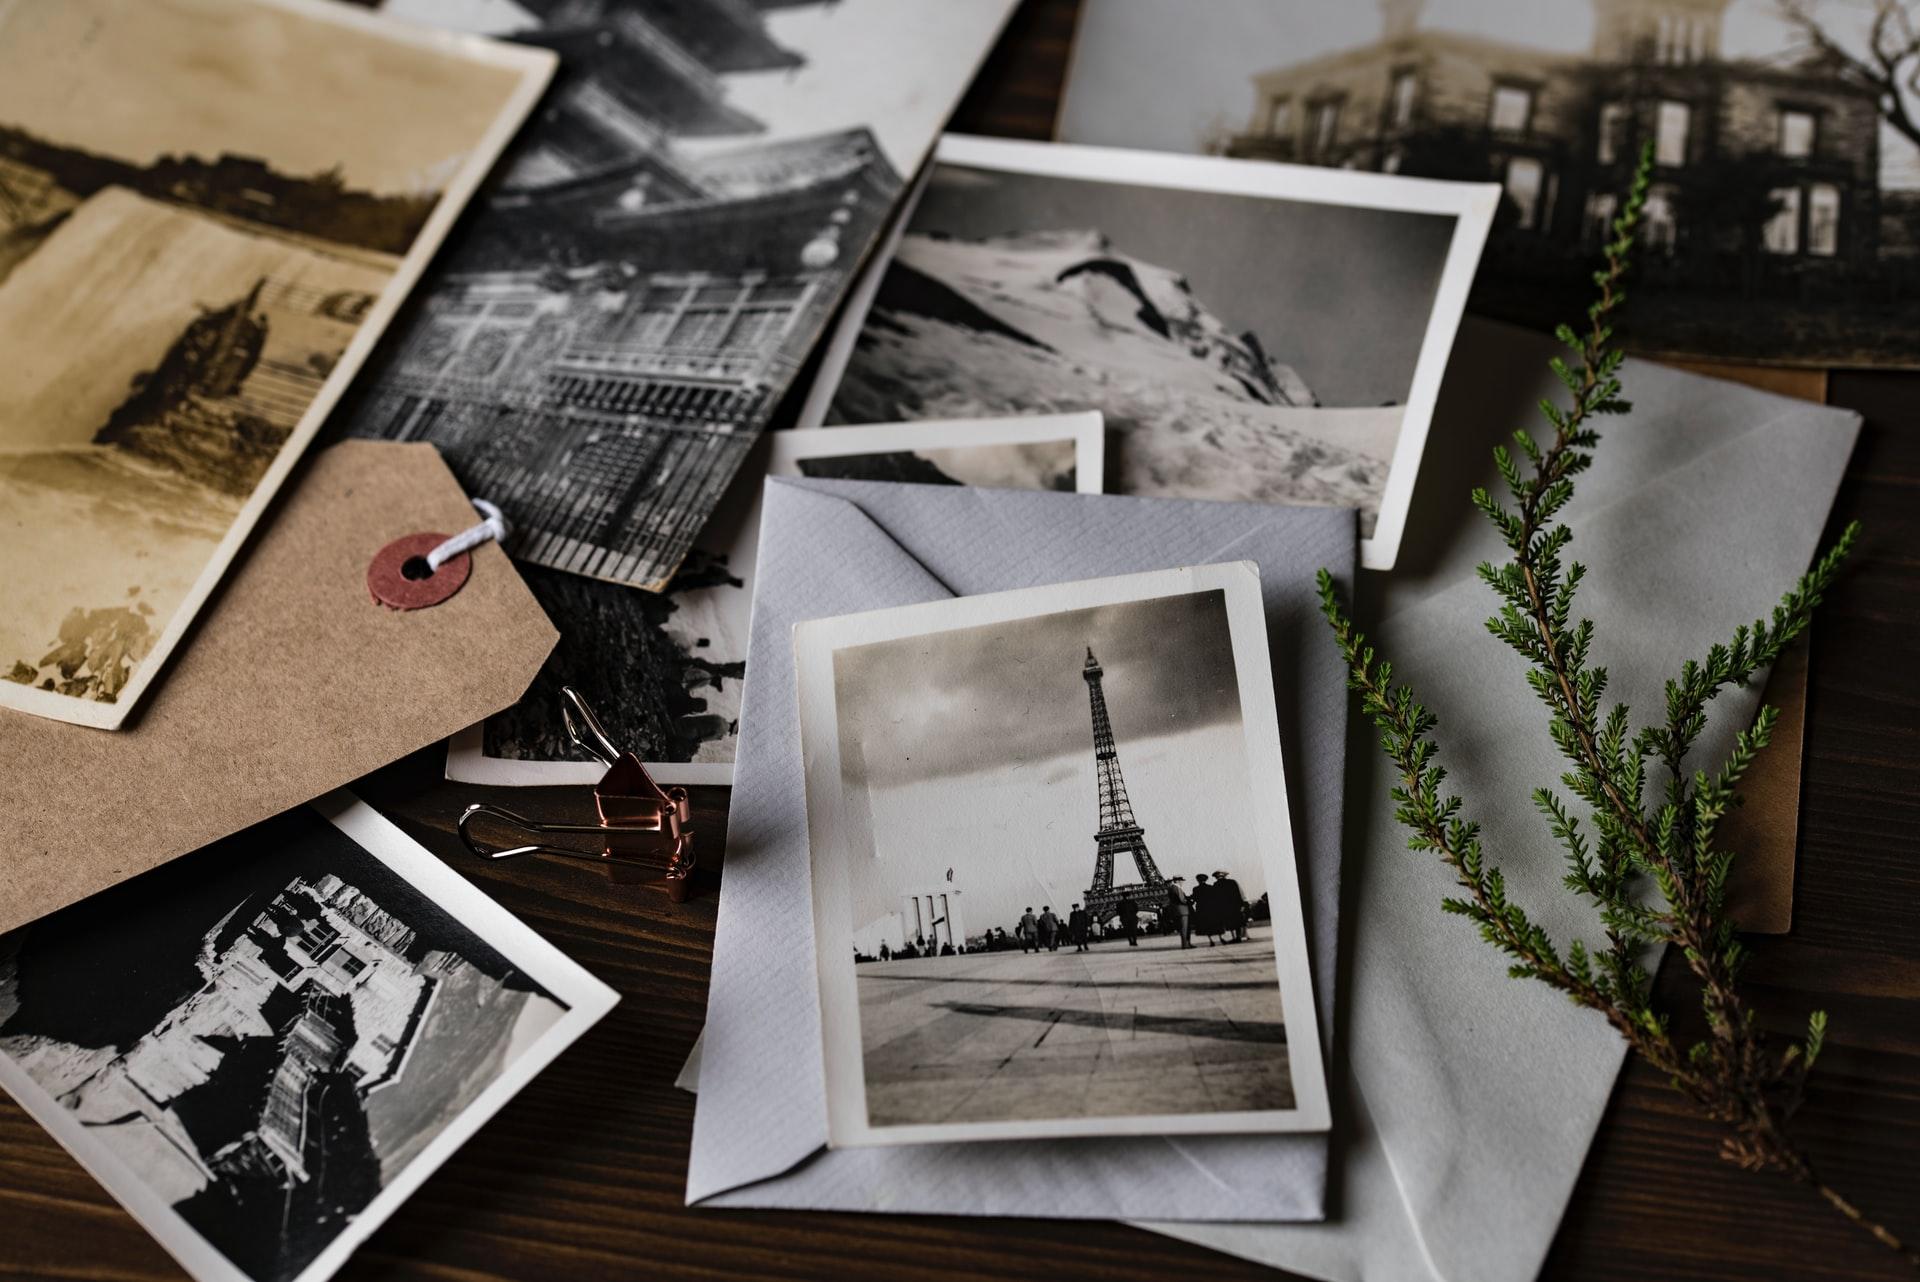 aria comment rediger un eloge funbre en rassemblant des souvenirs